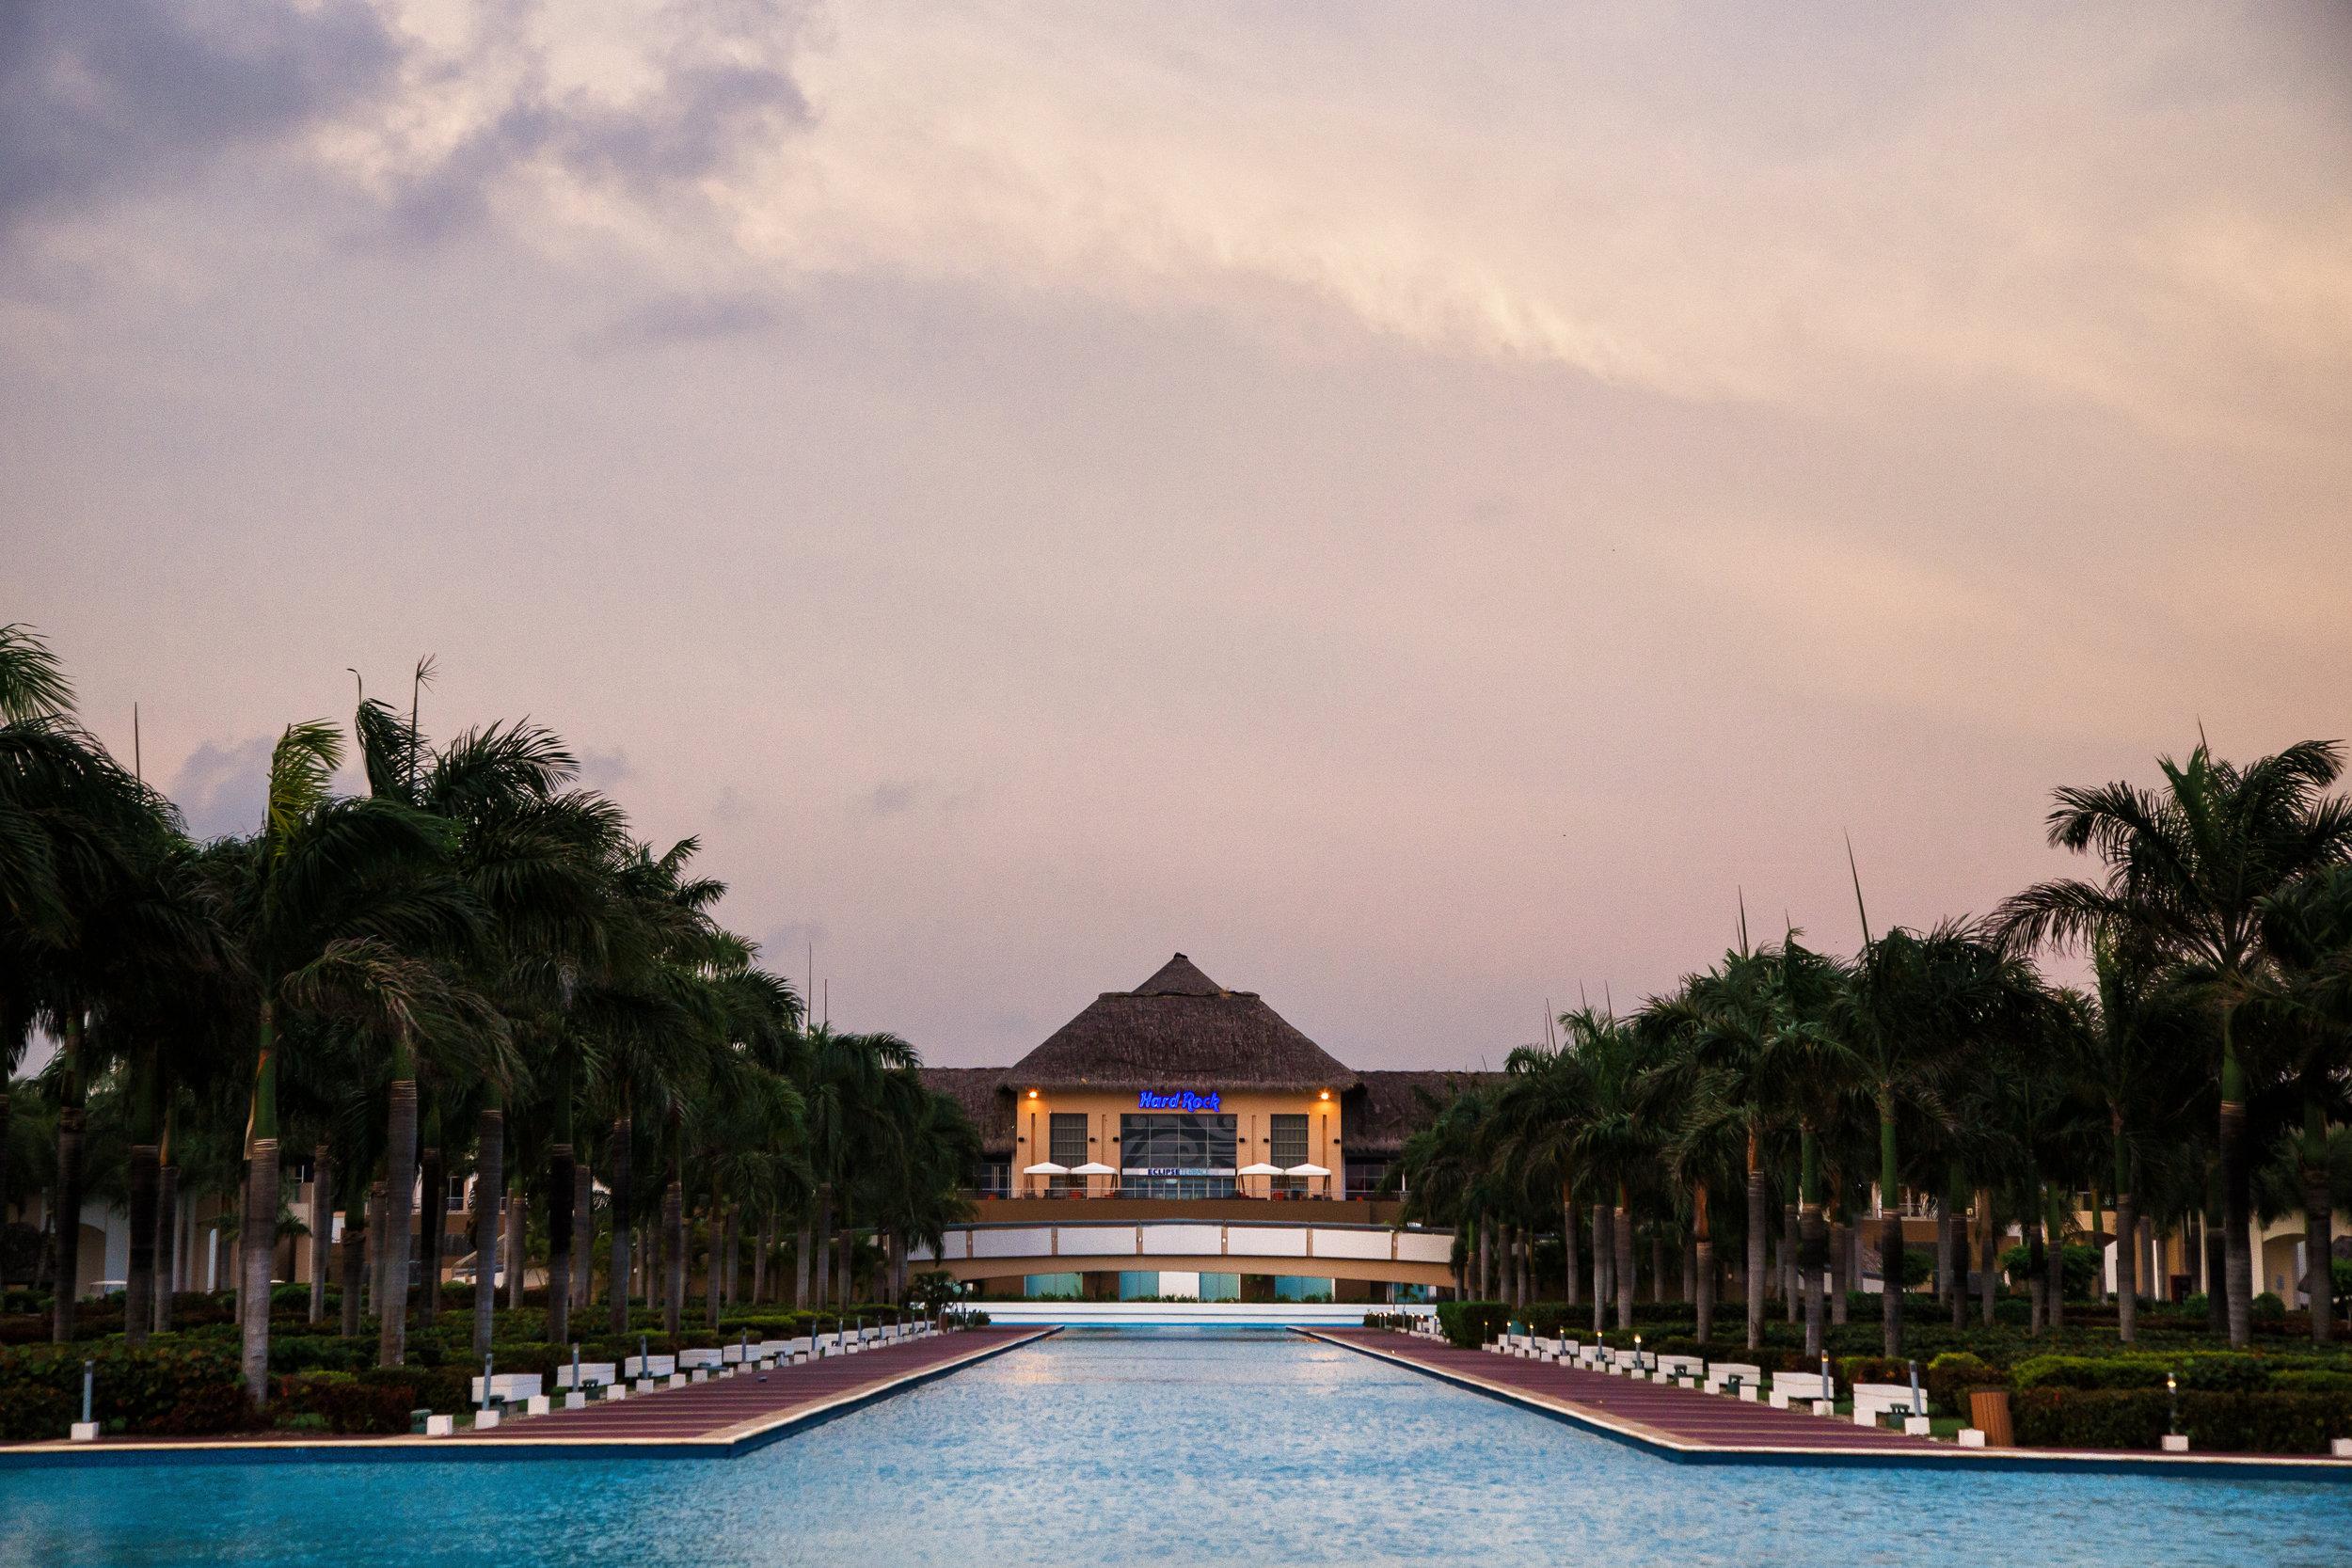 Hard Rock Hotel and Casino, Punta Cana.